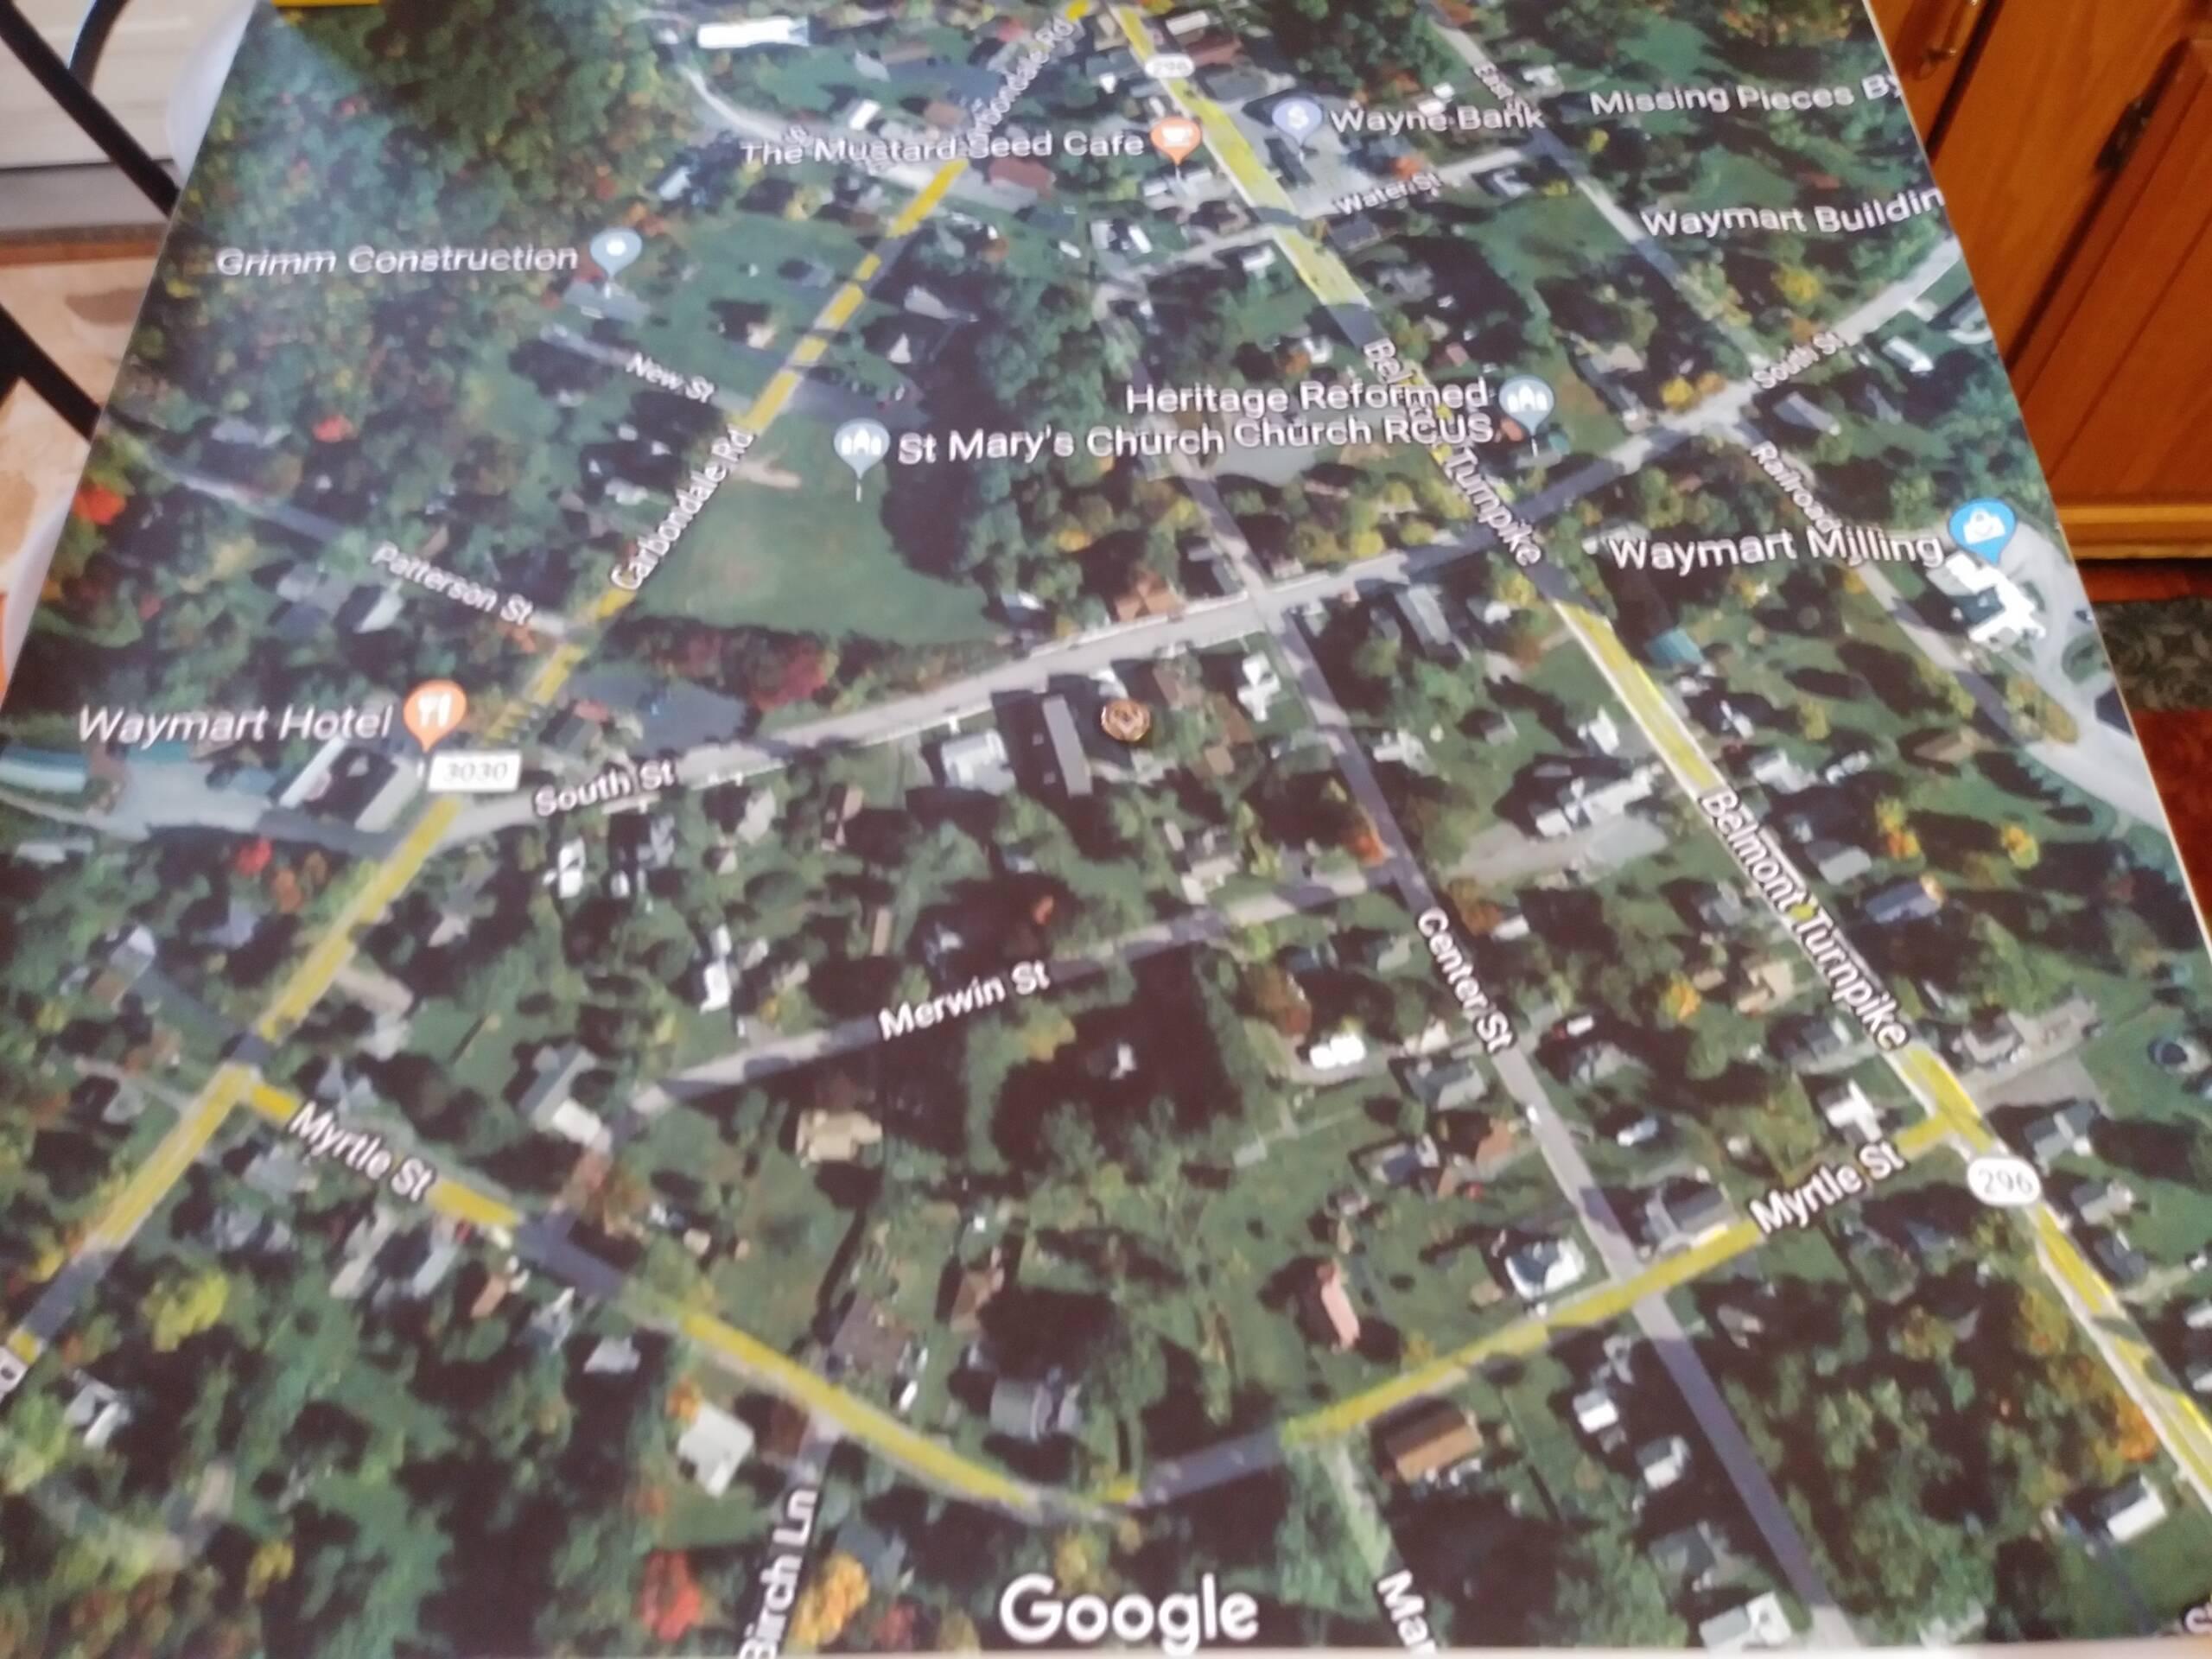 Google Maps layout of the surrounding streets around Waymart Lodge